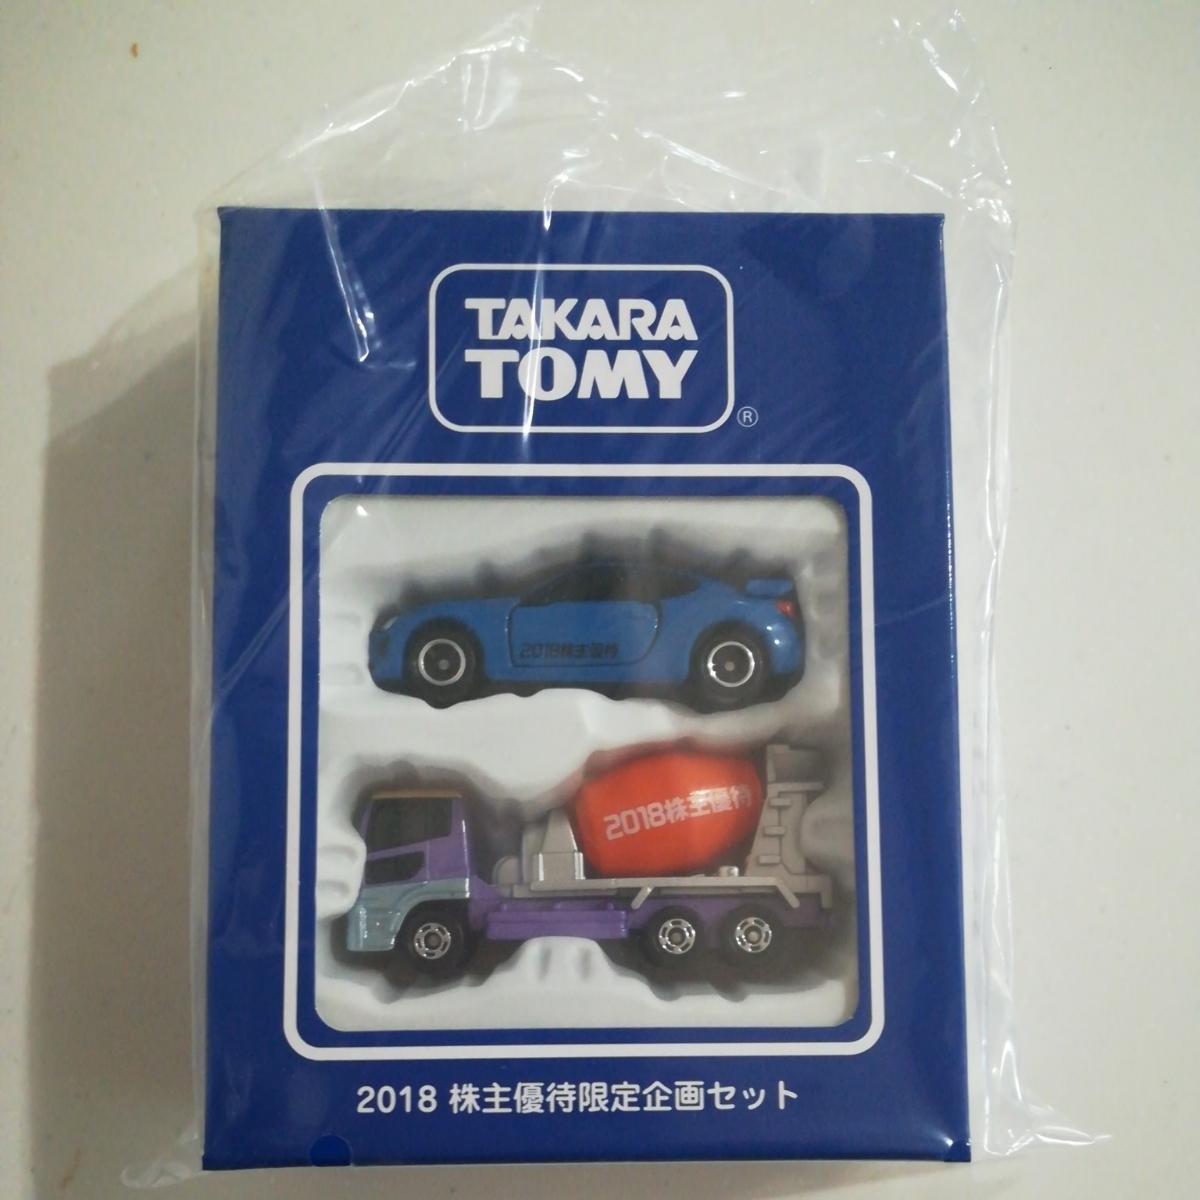 aa654539b89 未開封 トミカ 2018 株主優待 限定企画セット タカラトミー 平成最後 トヨタ86 UD